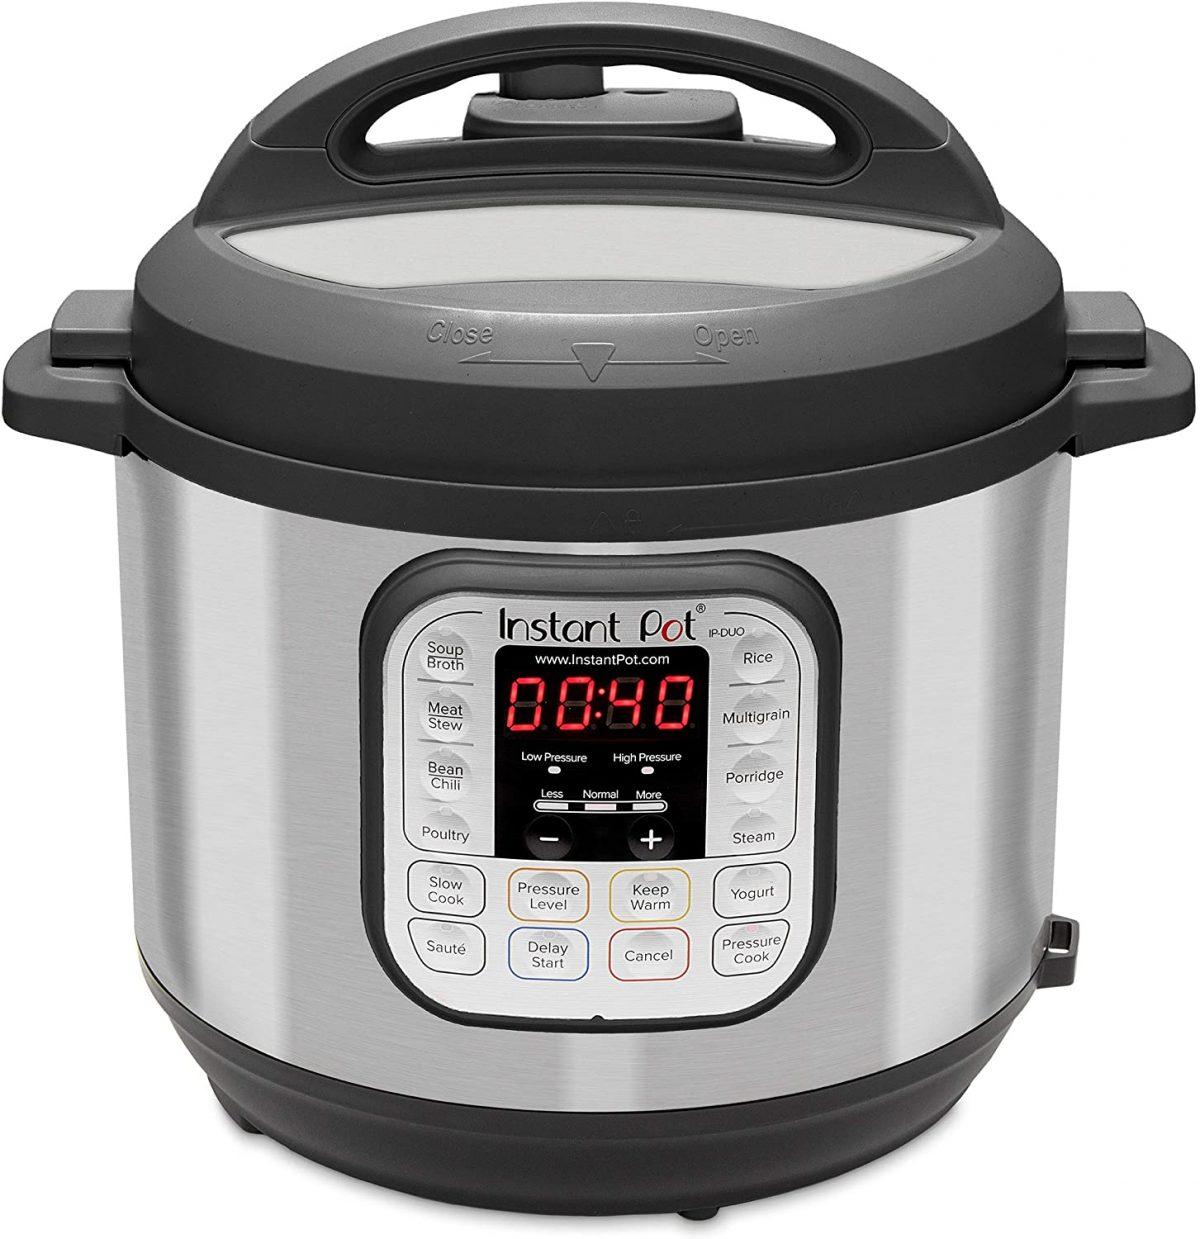 Instant Pot Duo 7-in-1 Electric Pressure Cooker, Sterilizer, Slow Cooker, Rice Cooker, Steamer, Saute, Yogurt Maker, and Warmer, 6 Quart